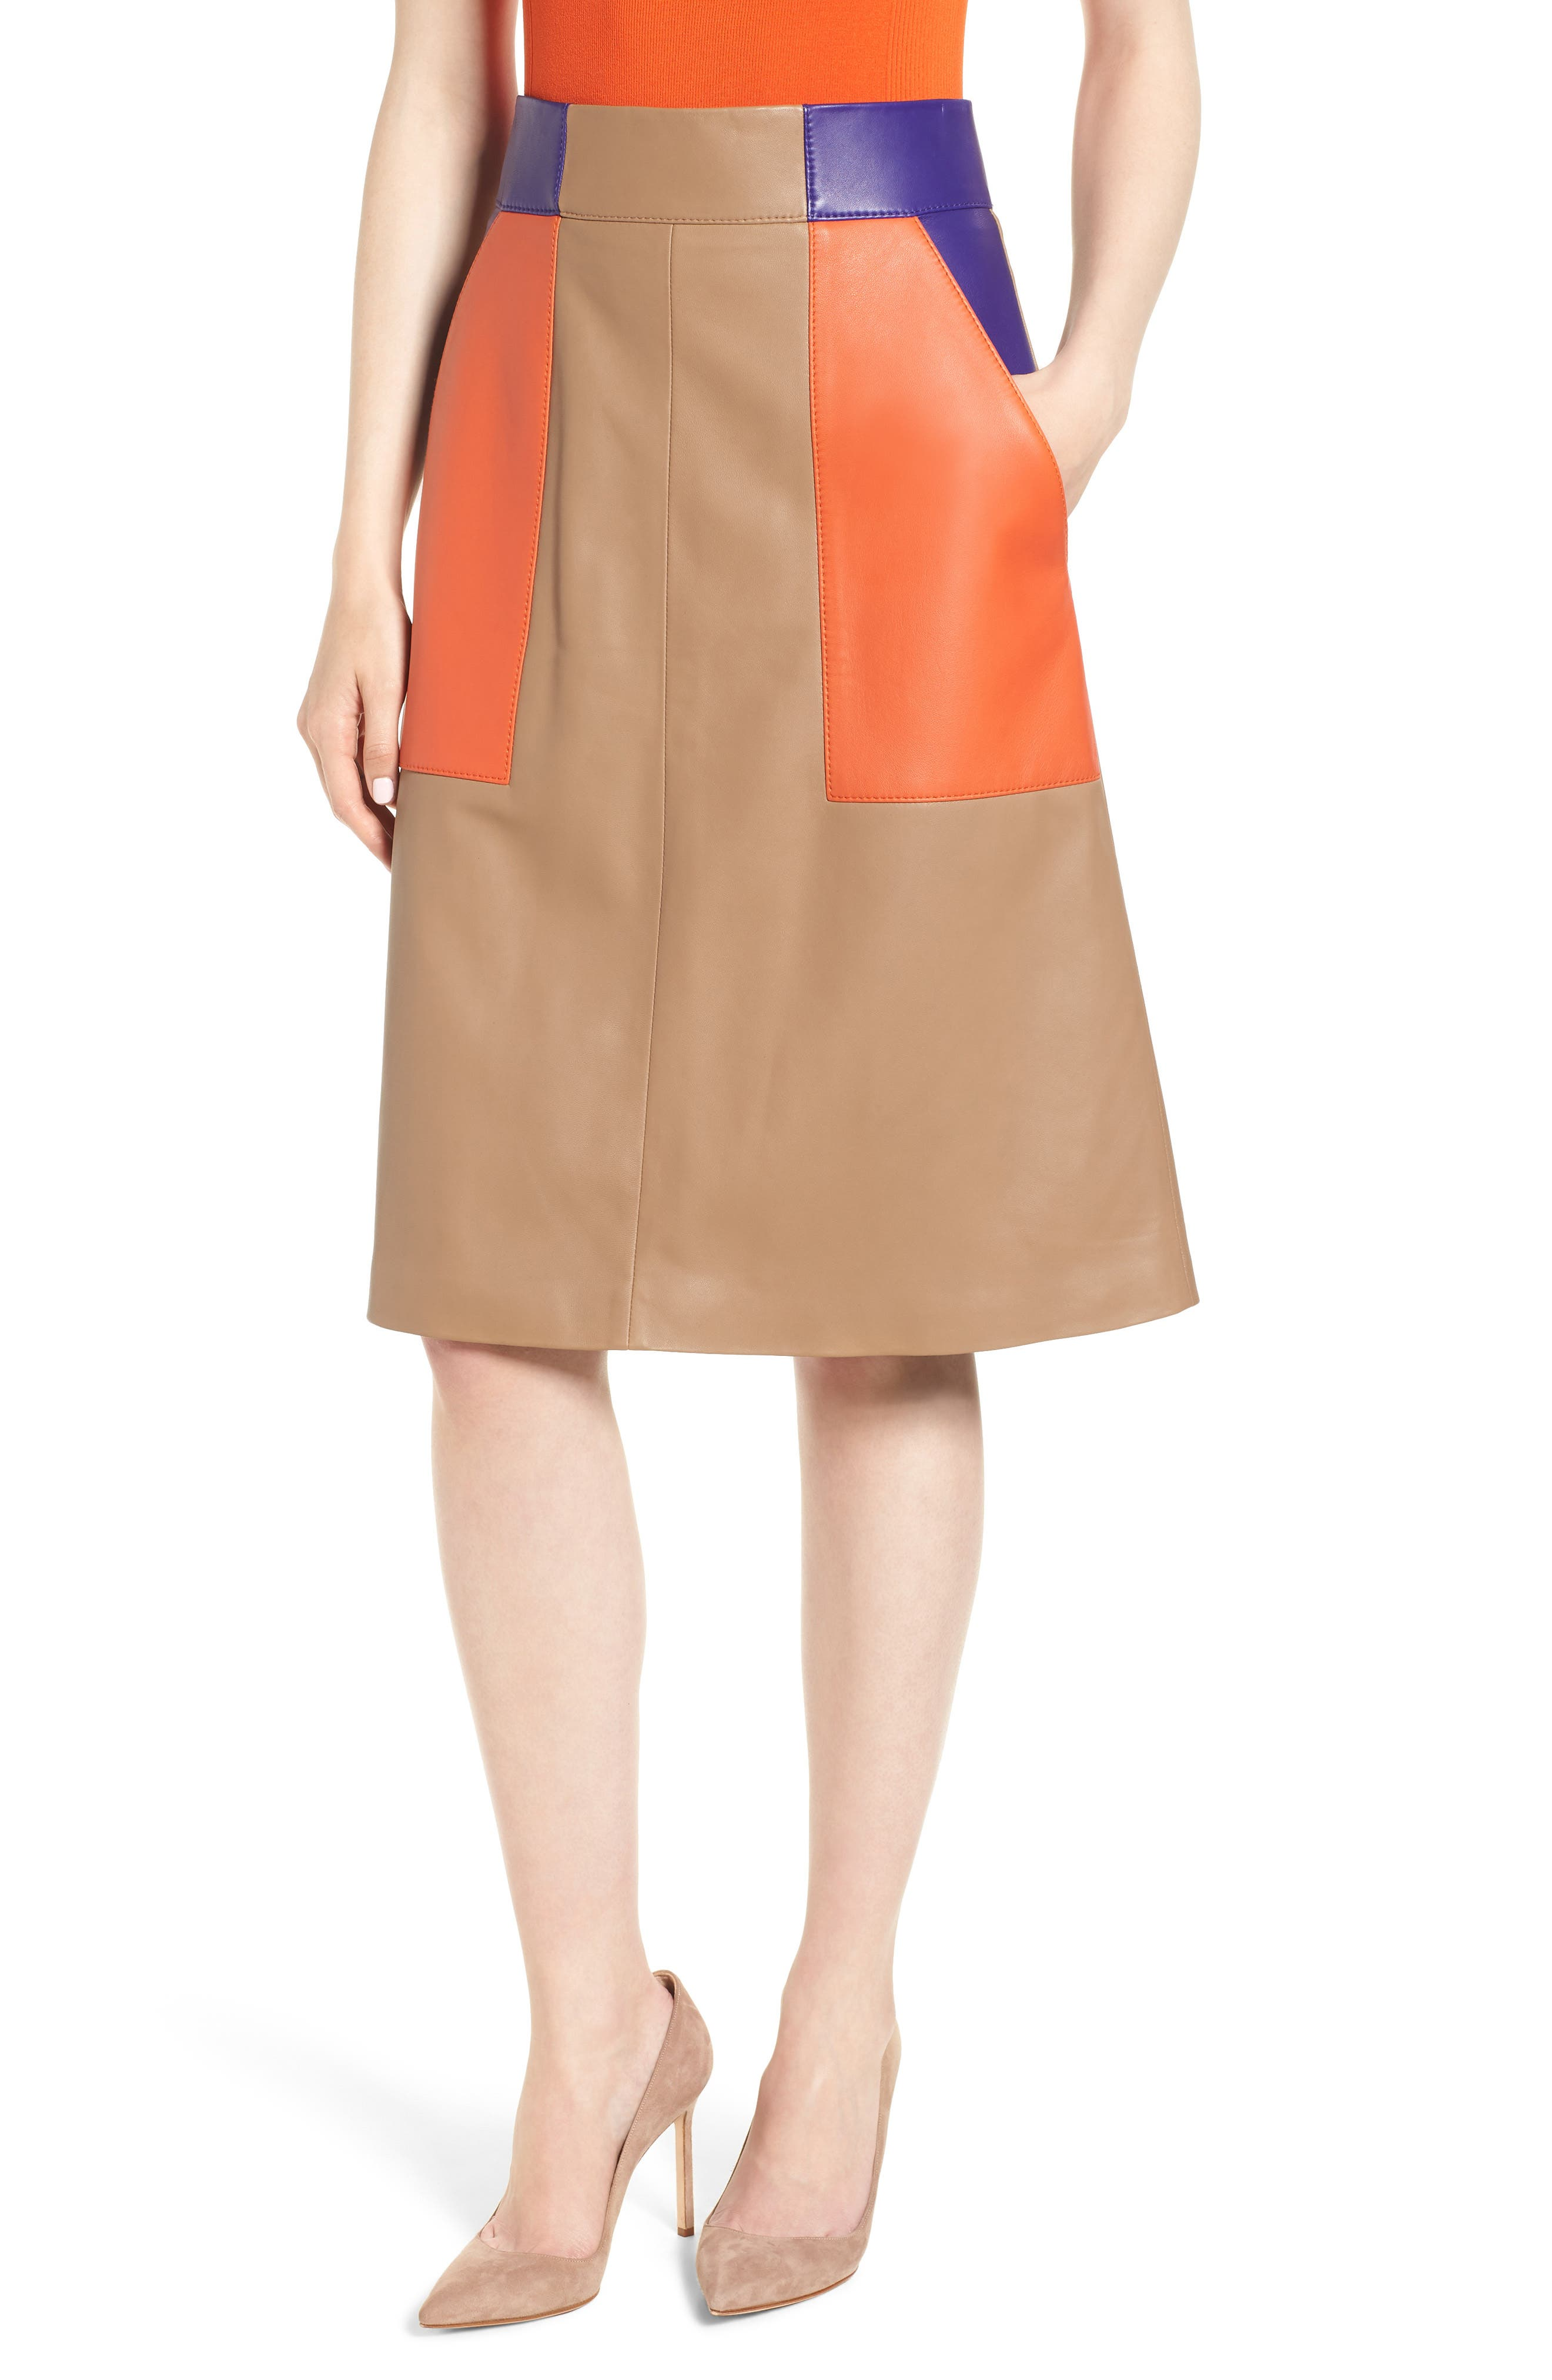 Seplea Colorblock Leather Skirt,                             Main thumbnail 1, color,                             Warm Clay Fantasy